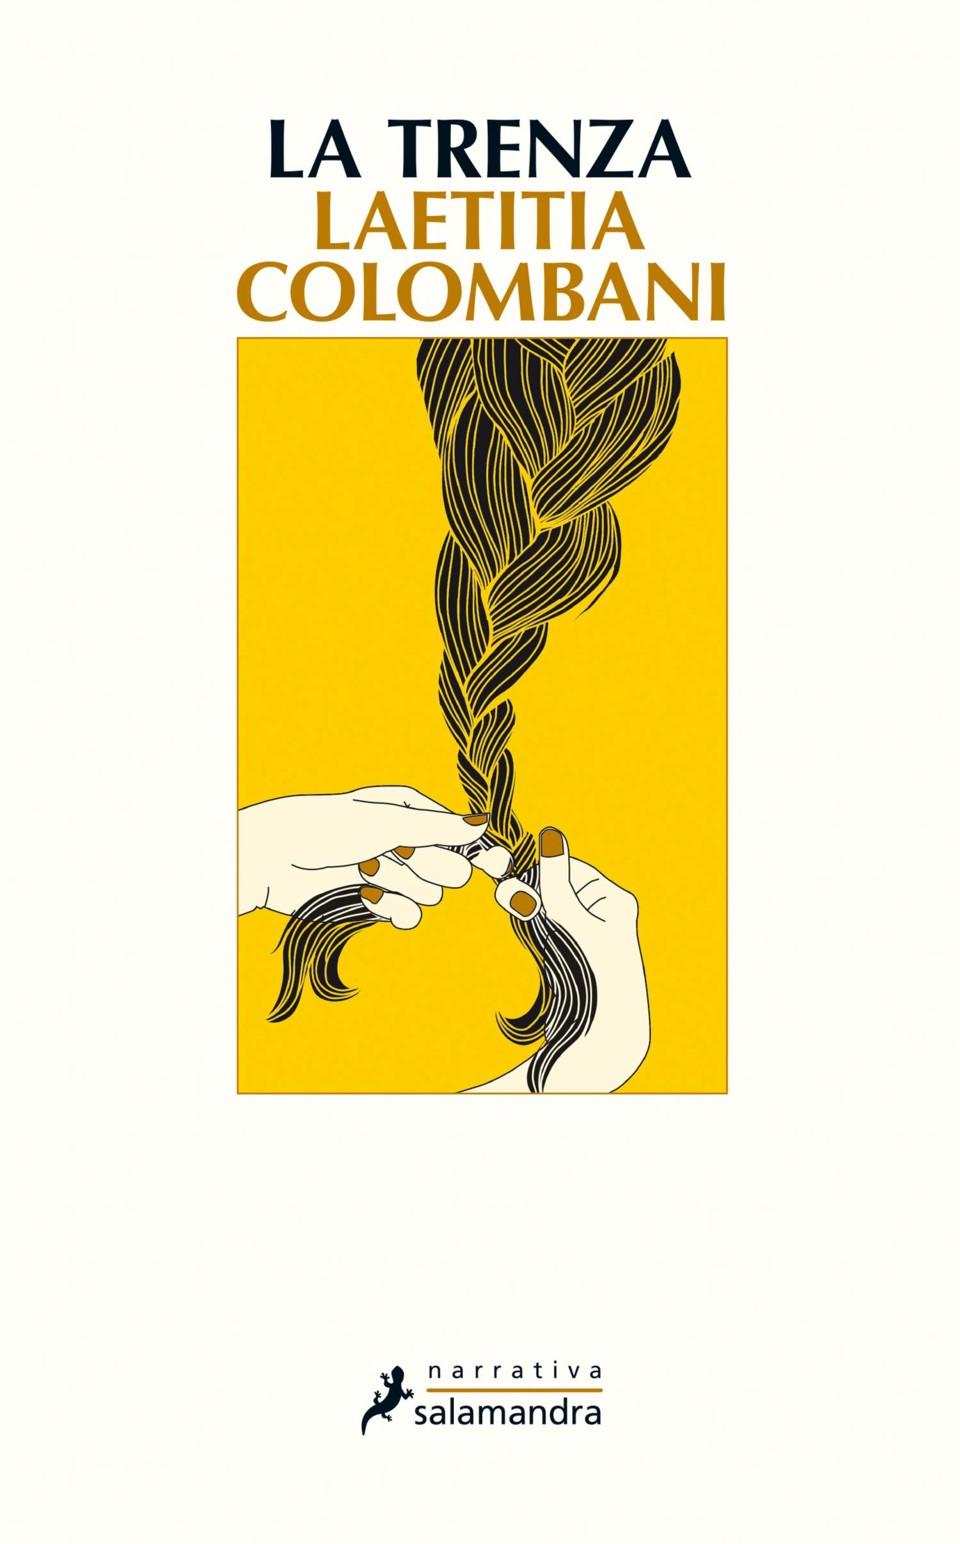 La trenza, de Laetitia Colombani